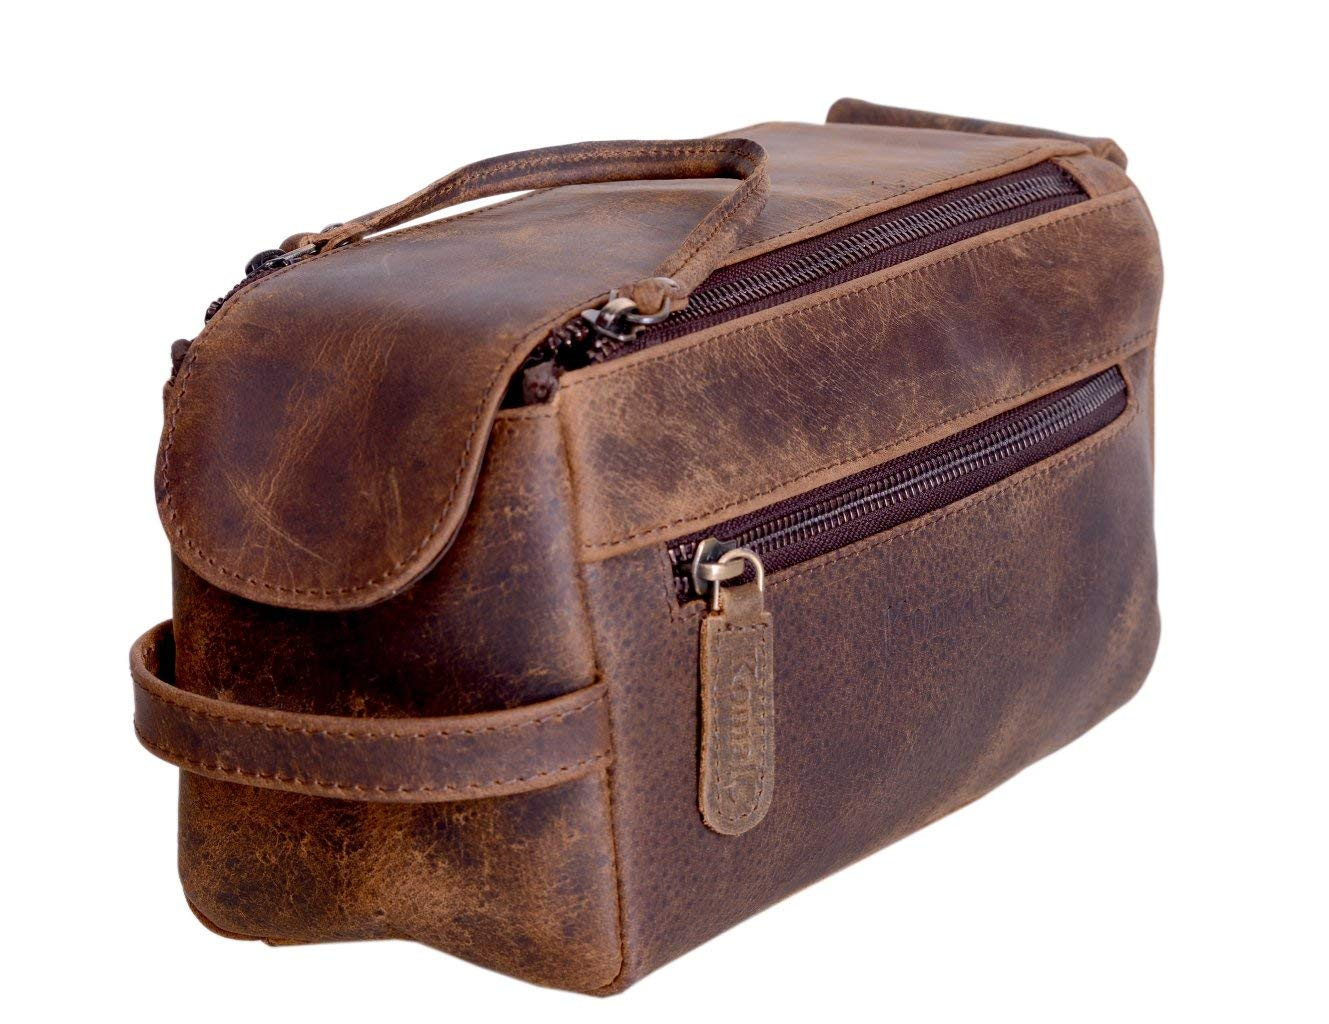 KOMALC Genuine Buffalo Leather Unisex Toiletry Bag Travel Dopp Kit by KomalC